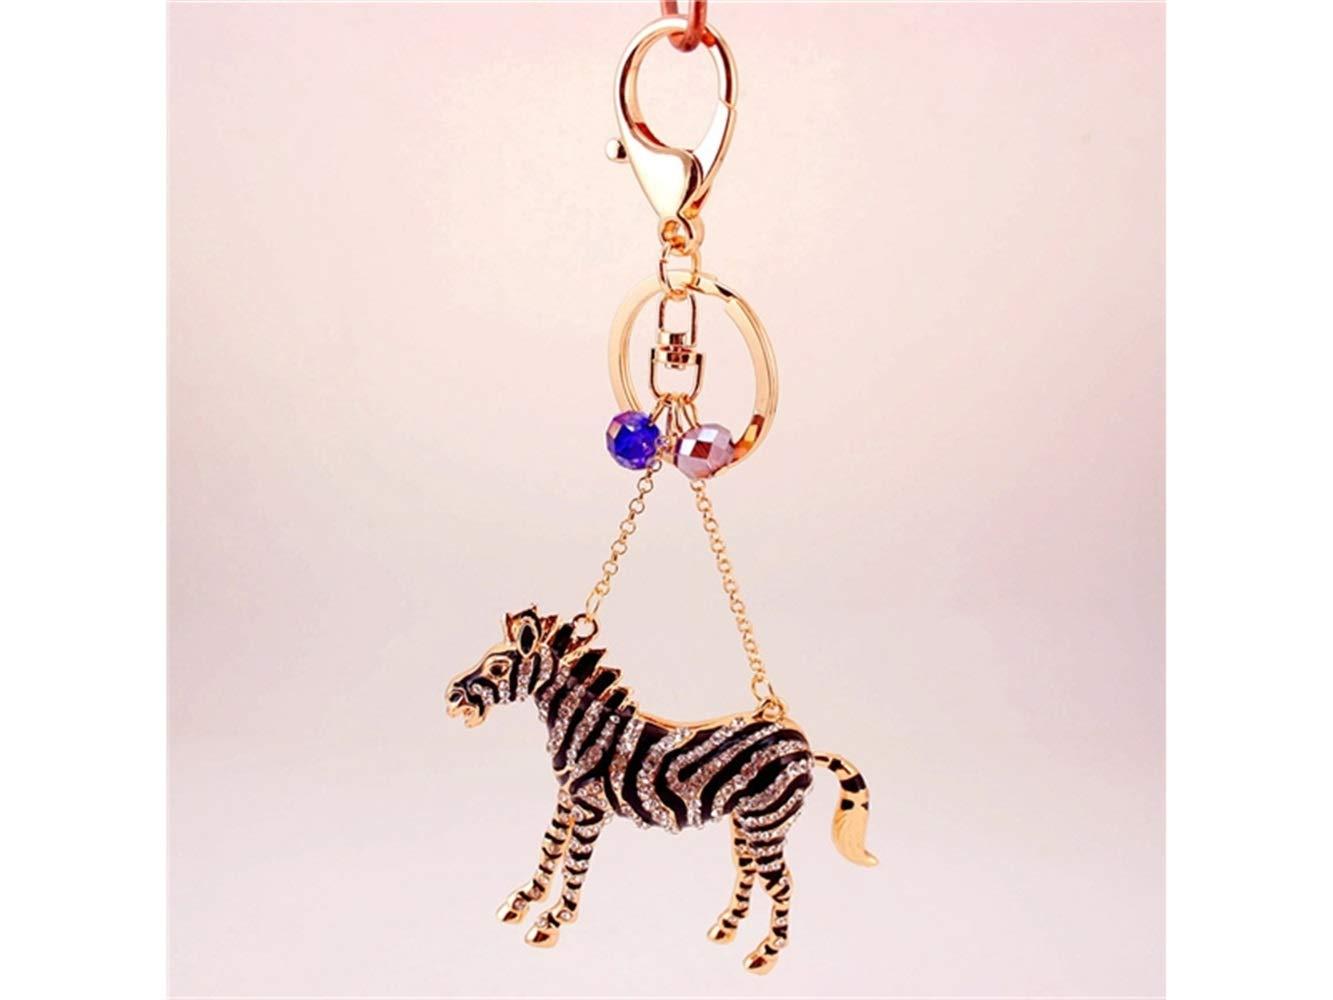 Car Keychain, Cute Exquisite Zebra Keychain Animal Key Trinket Car Bag Key Holder Decorations(Black) for Gift by Huasen (Image #2)